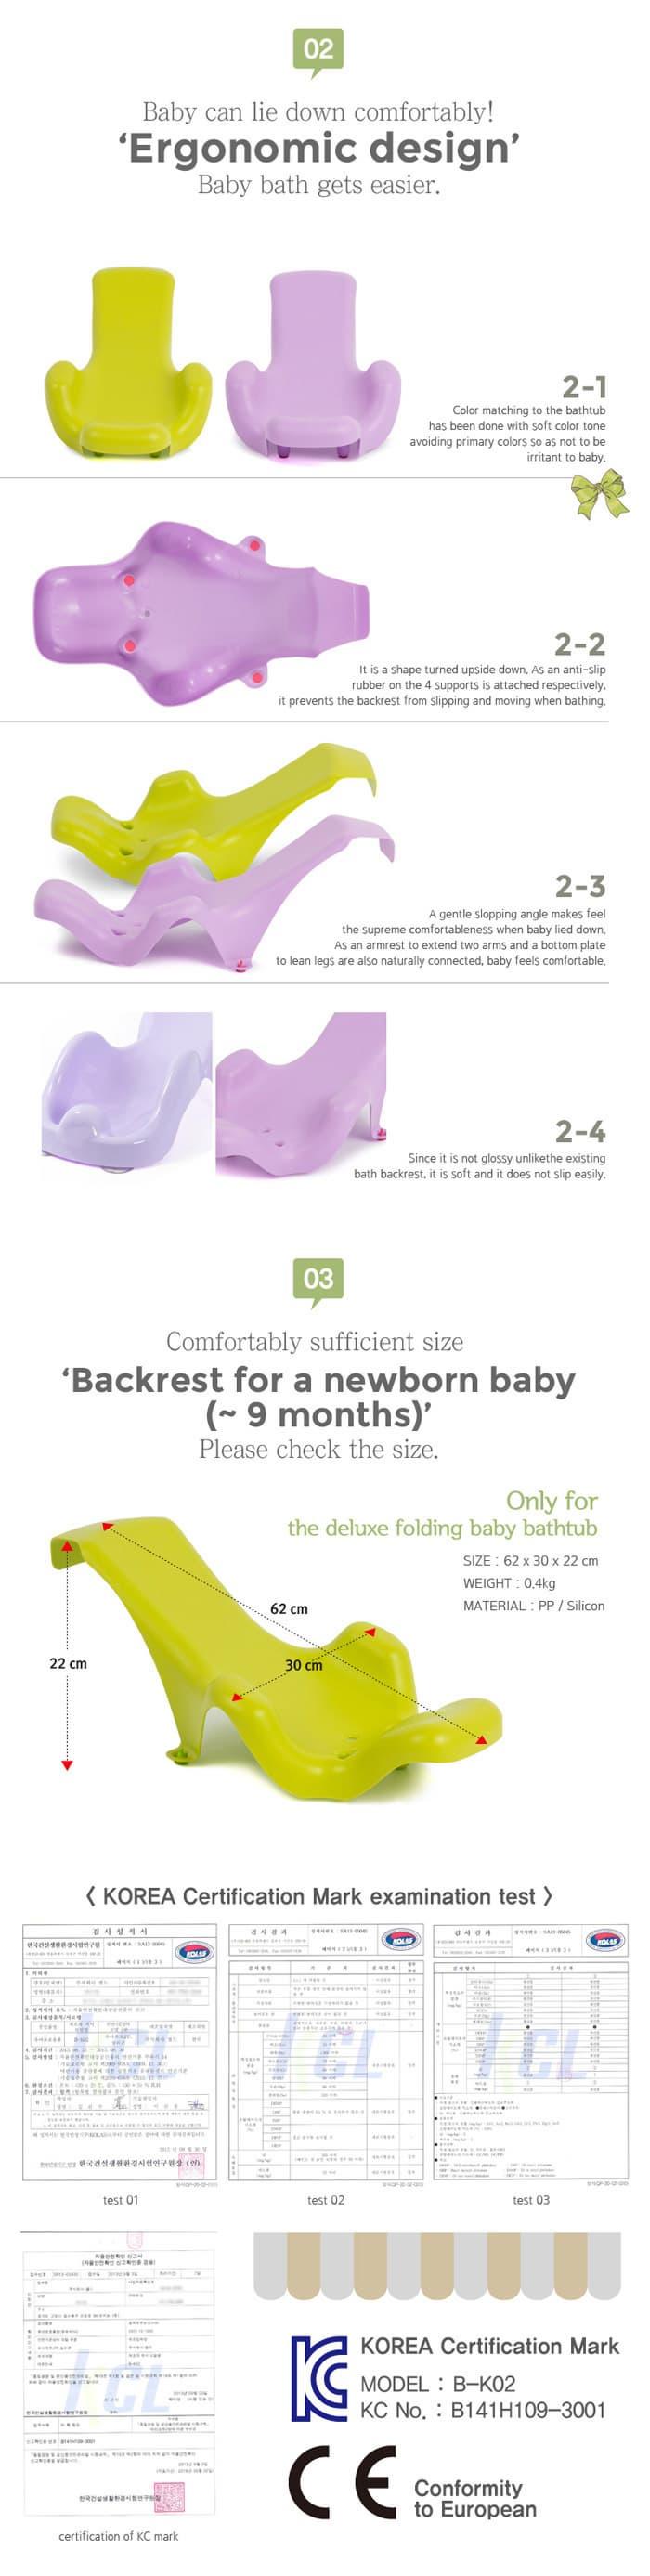 02-Baby-Lay-Back-Bath-Seat-003.jpg